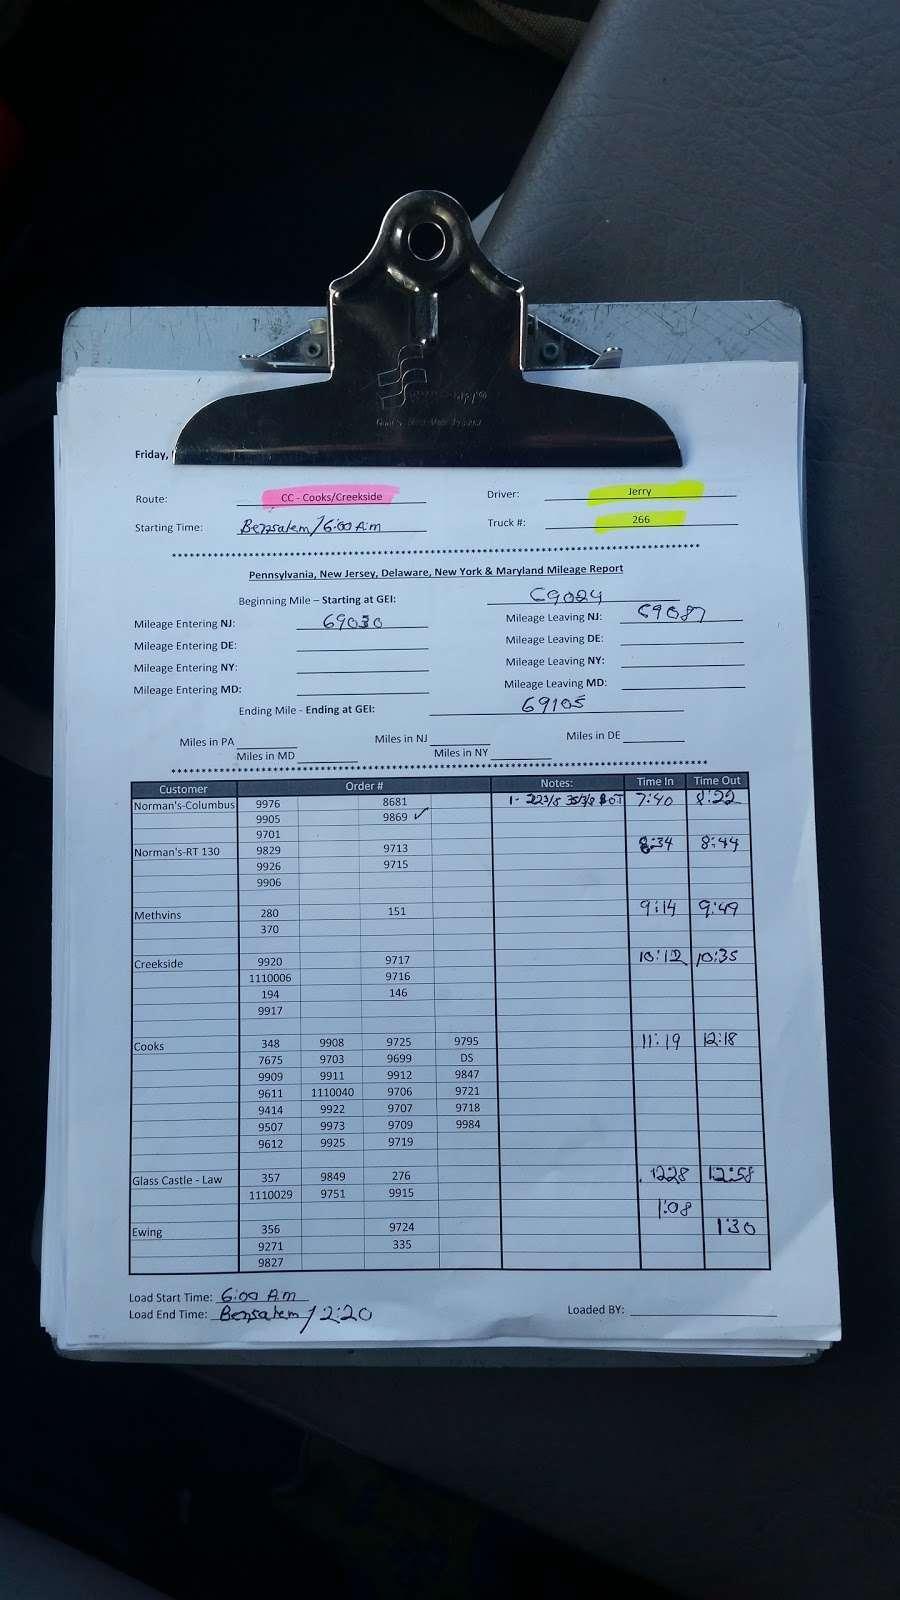 Mustang Stables - car repair  | Photo 5 of 5 | Address: 2260 New York Ave, Bensalem, PA 19020, USA | Phone: (215) 638-0777